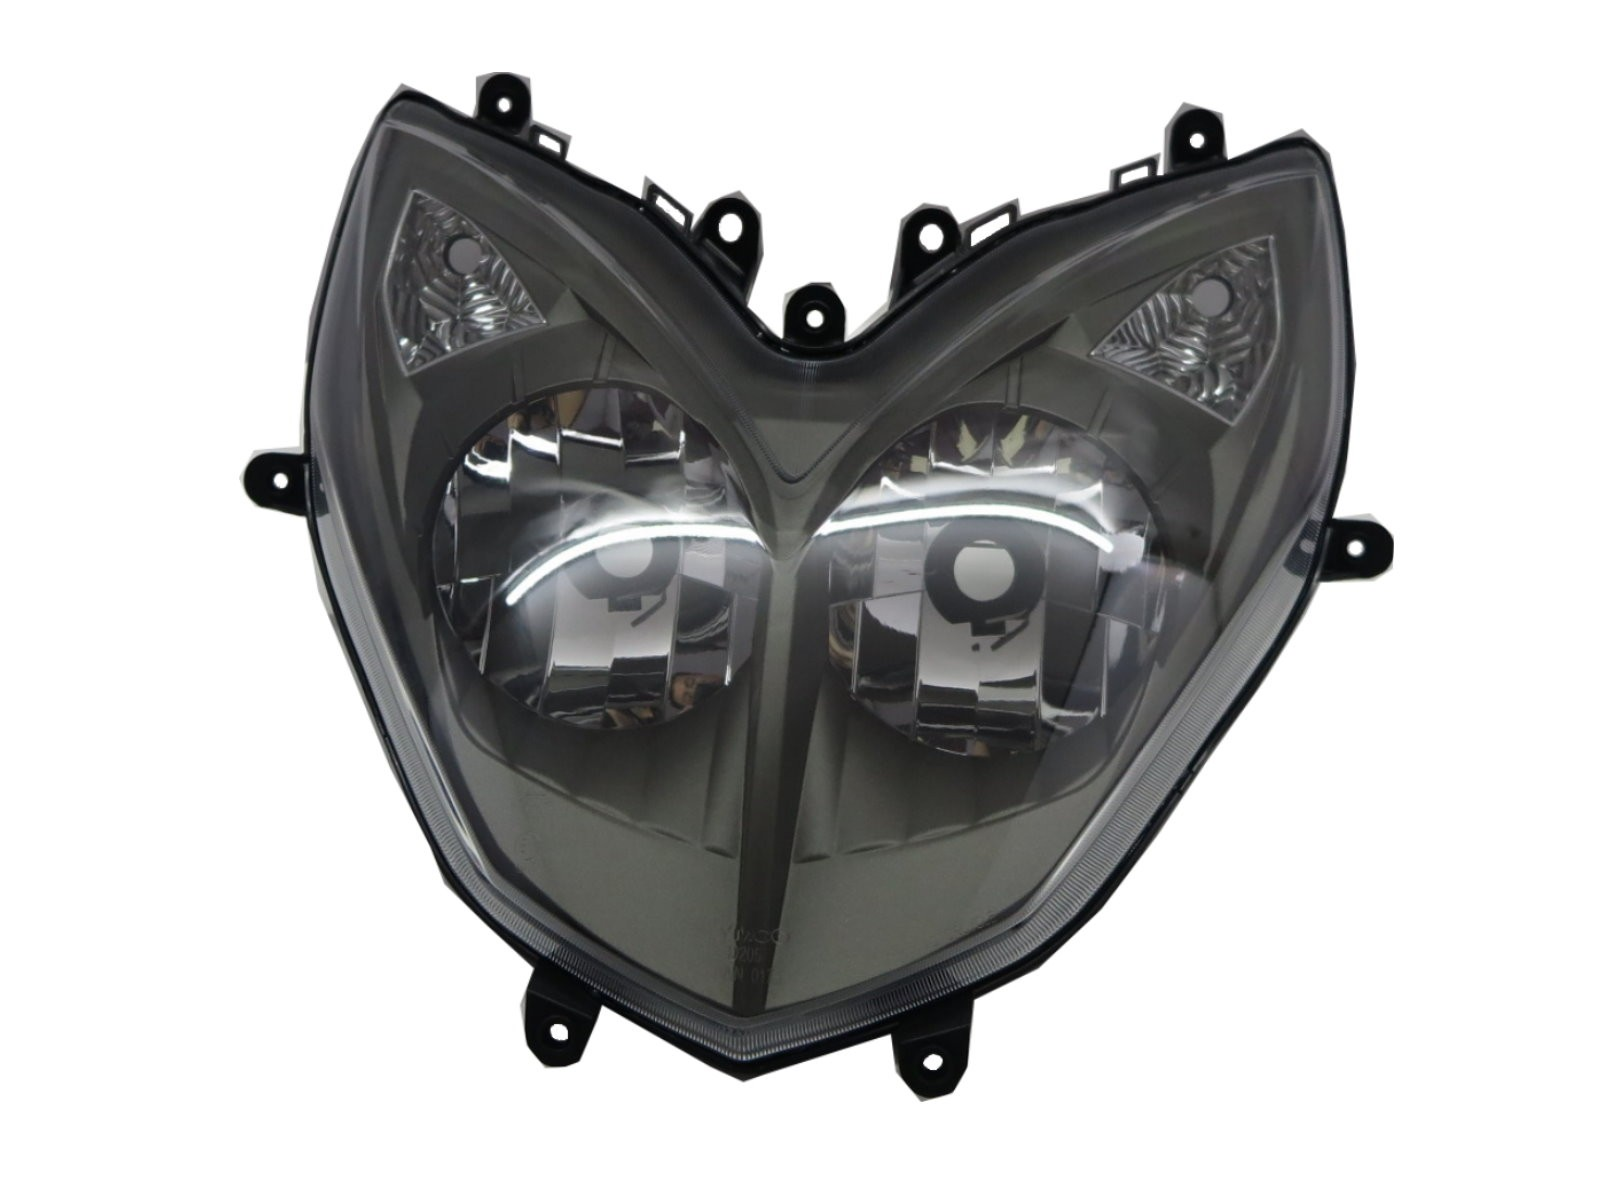 CrazyTheGod Movie 2013-2014 Motorcycles Clear Headlight Headlamp Black for Kymco